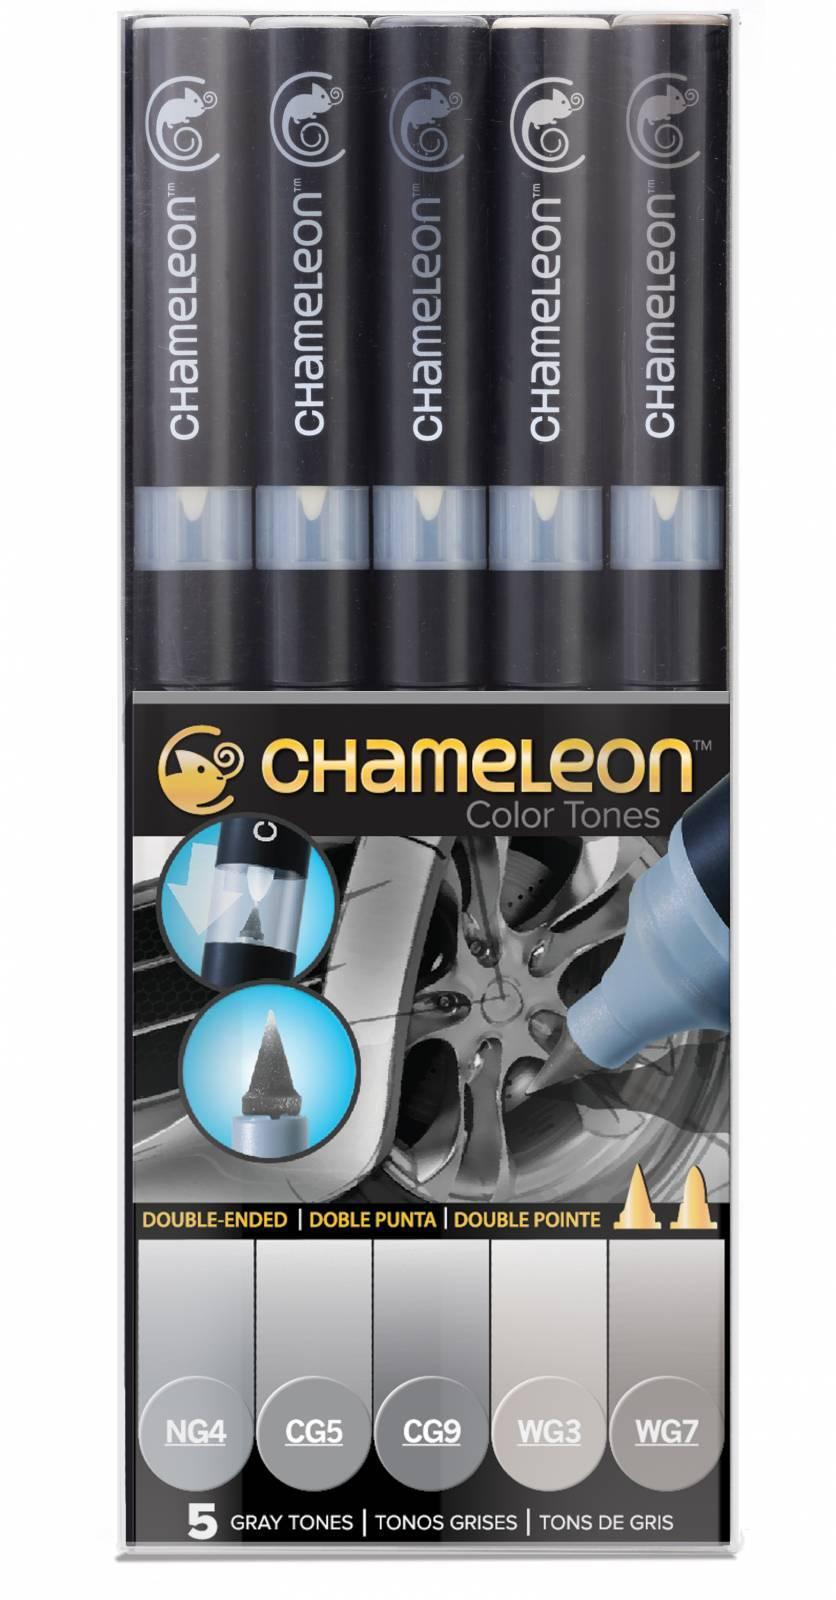 Kit Chameleon 5 canetas - Tons de Cinza - Papelaria Botafogo